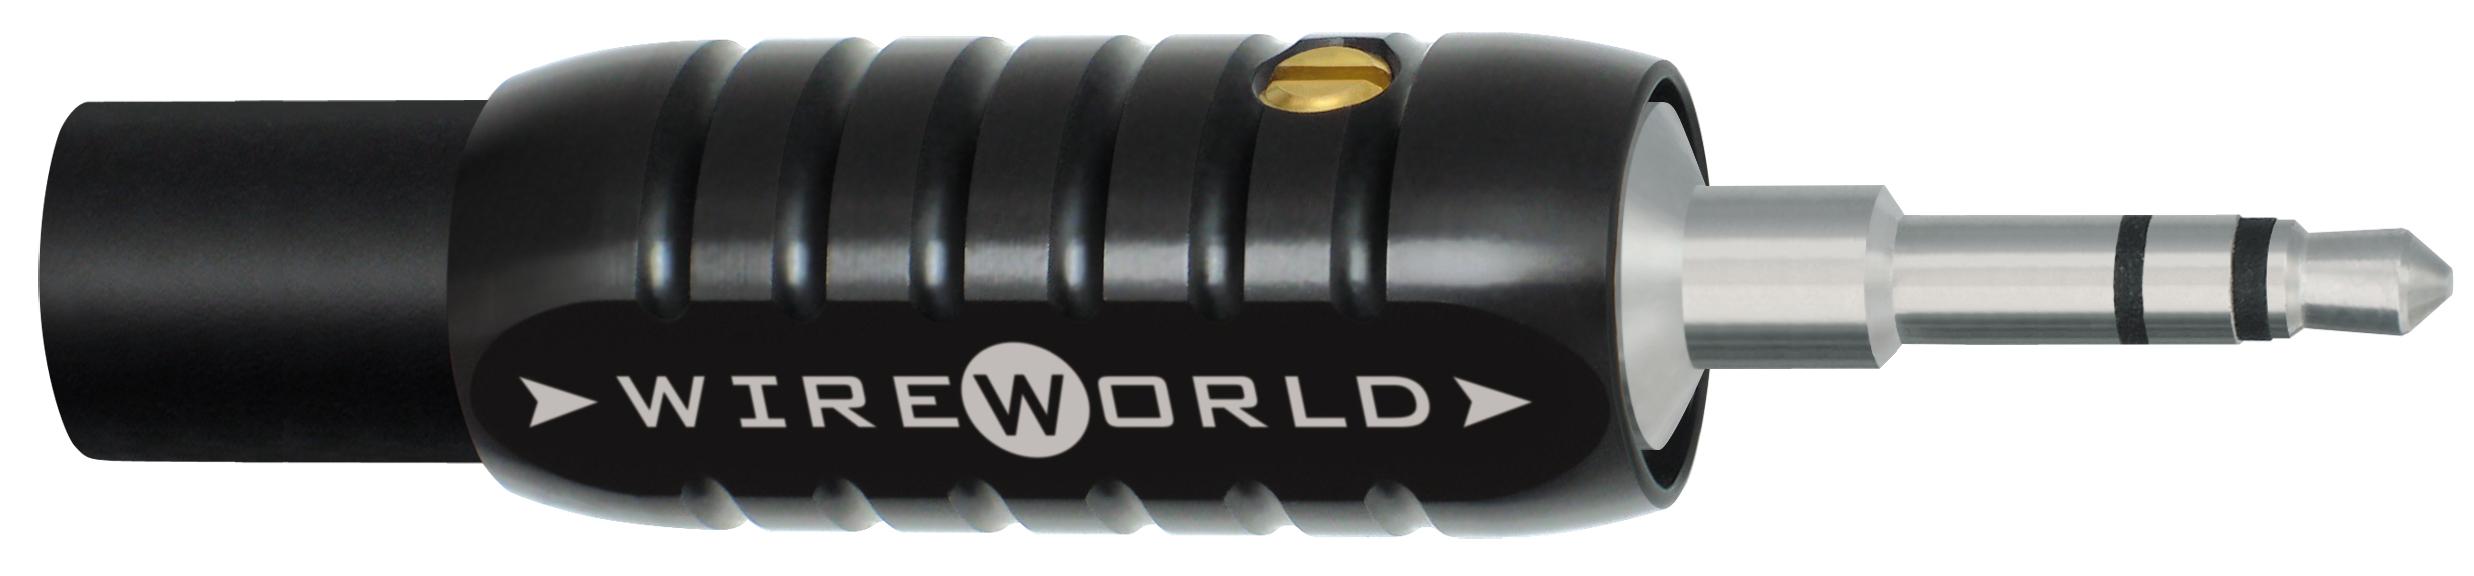 Wireworld Konektor Jack 3.5mm Pre ECI/SEI/GEI